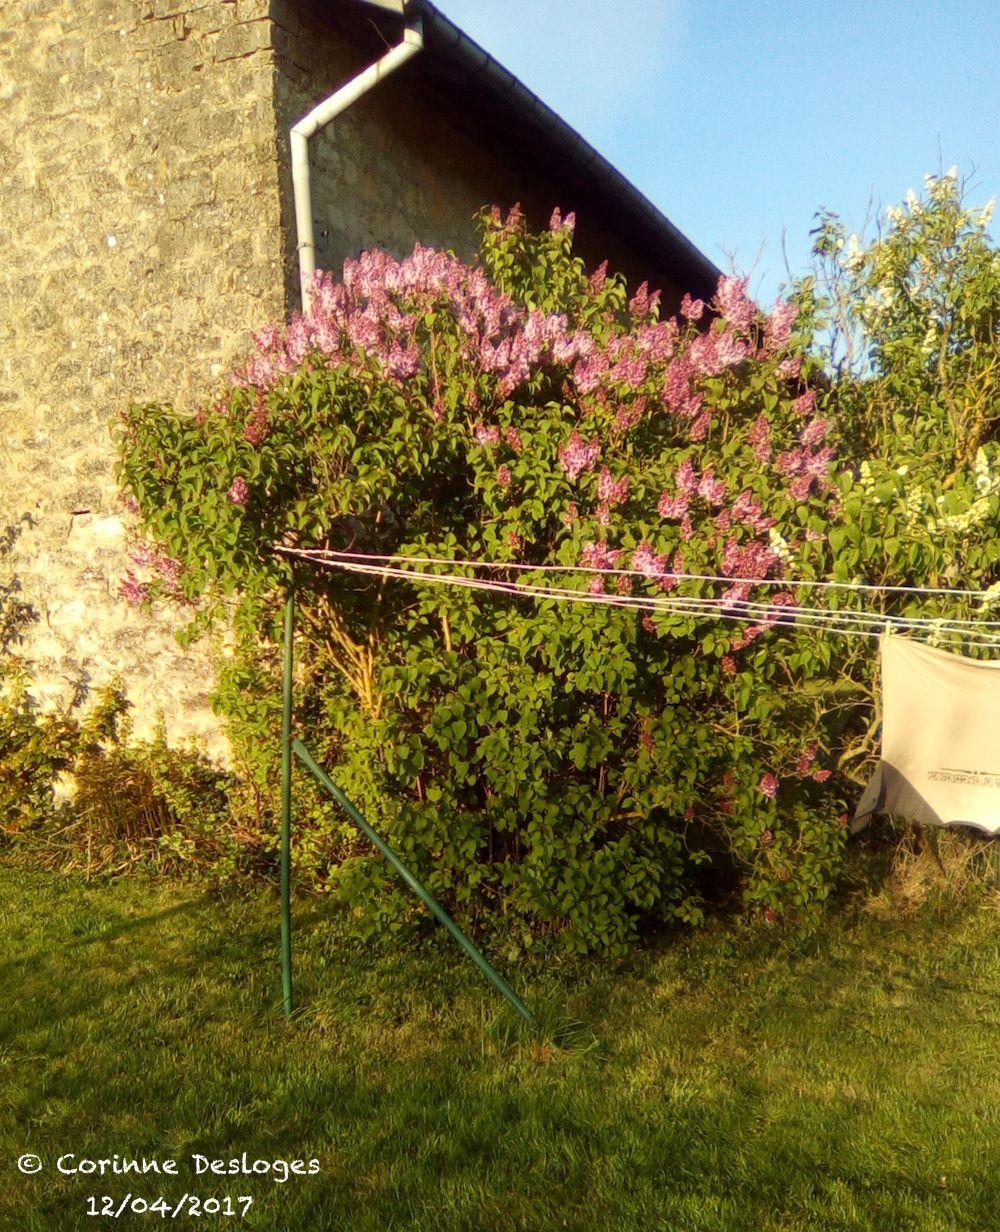 Du jardinage creativ idees le blog de casse bonbeca for Jardin 93